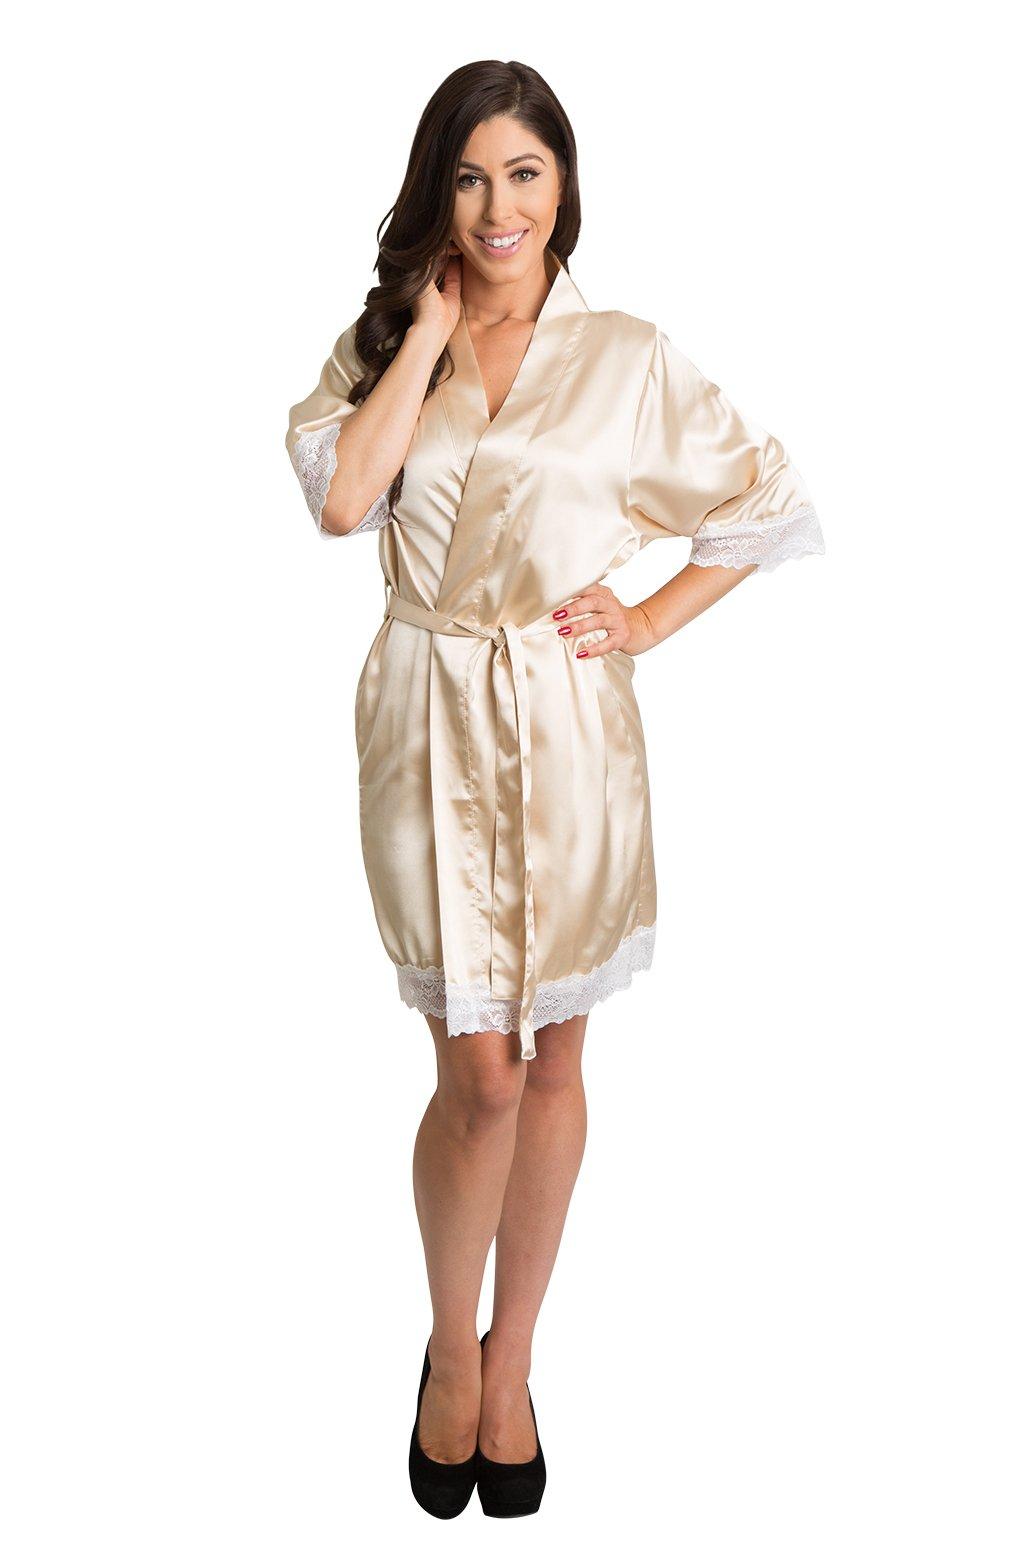 Zynotti Women's Lace Trim Bridal Kimono Wedding Satin Robe for Bride Bridesmaid and Maid of Honor